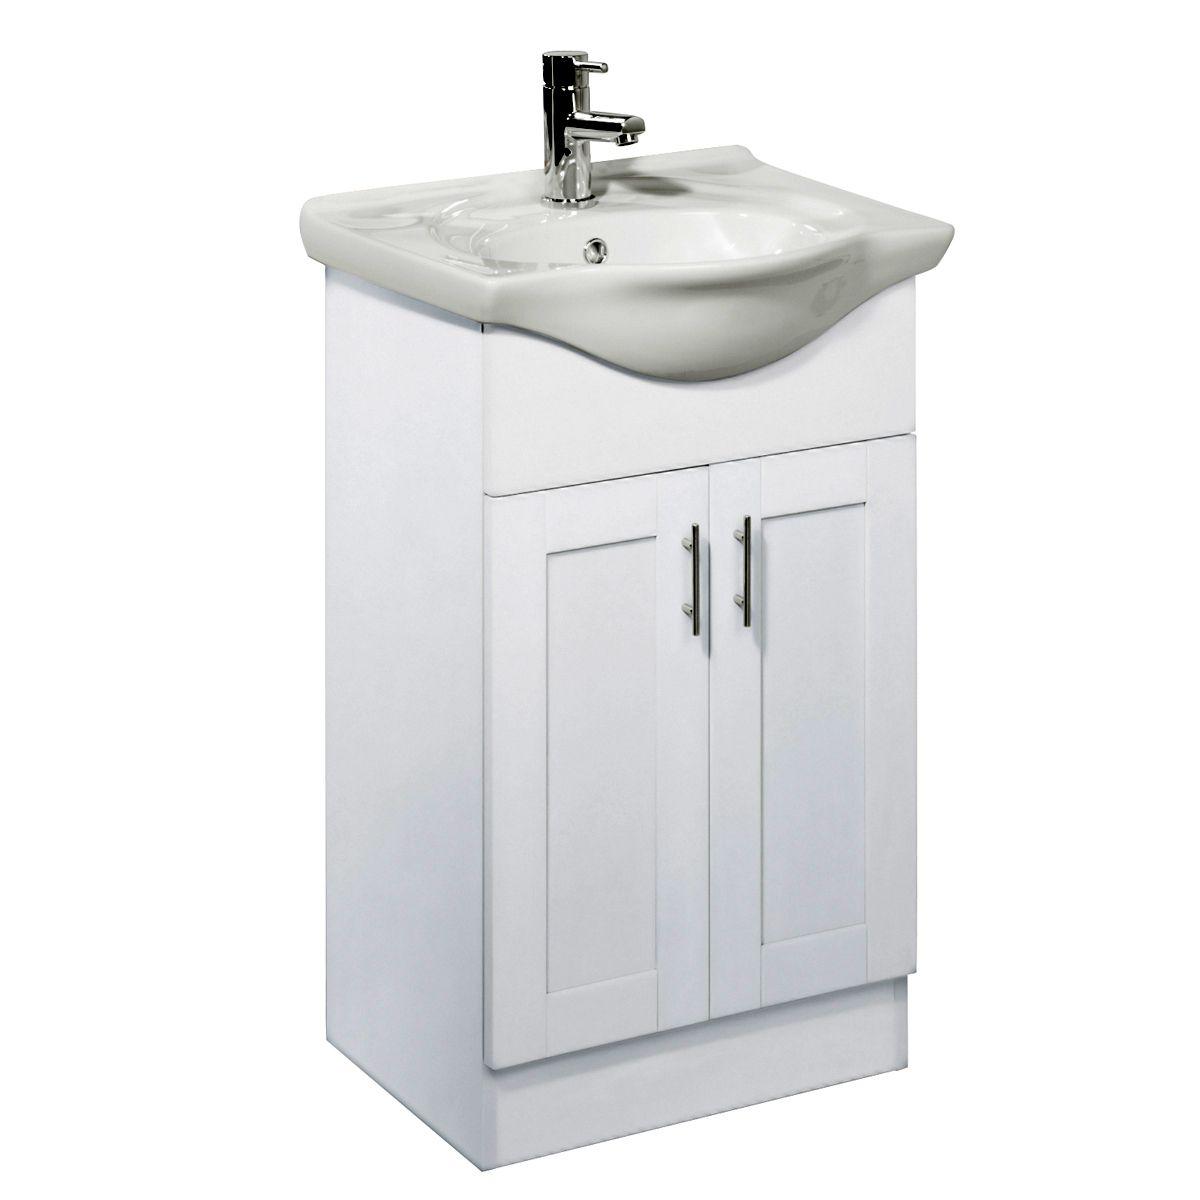 Roper rhodes new england 500mm freestanding vanity unit uk bathrooms for Free standing bathroom vanity units